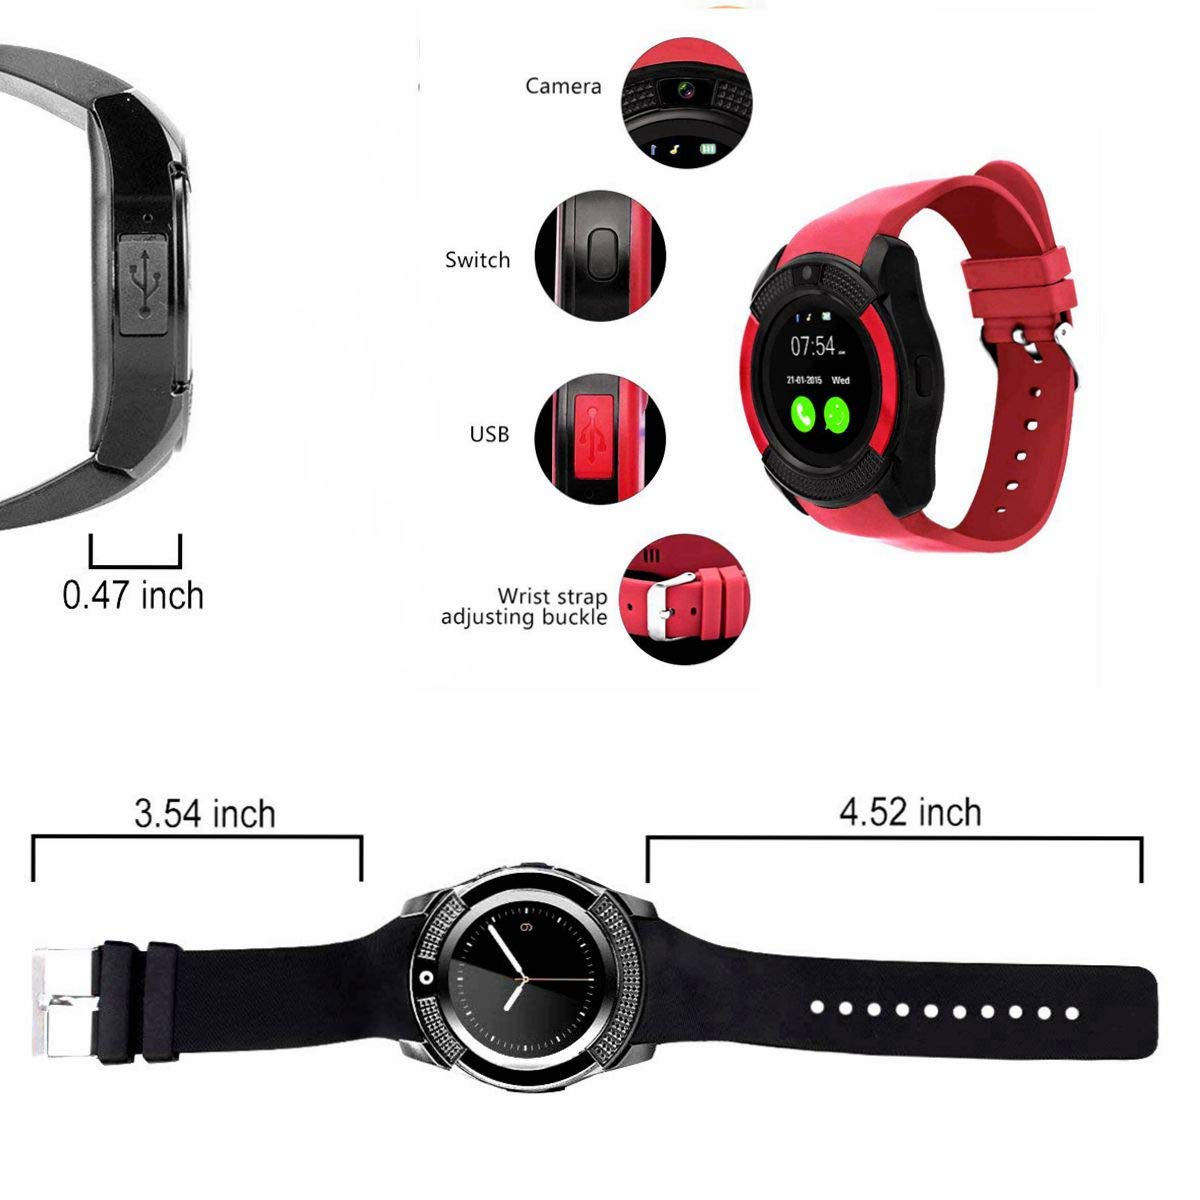 CatShin Smartwatch Android-Reloj Inteligente Mujer Hombre CS05 con Ranura para Tarjeta SIM/TF,Reloj Deportivo Cronómetro Podómetro Monitor de Sueño ...